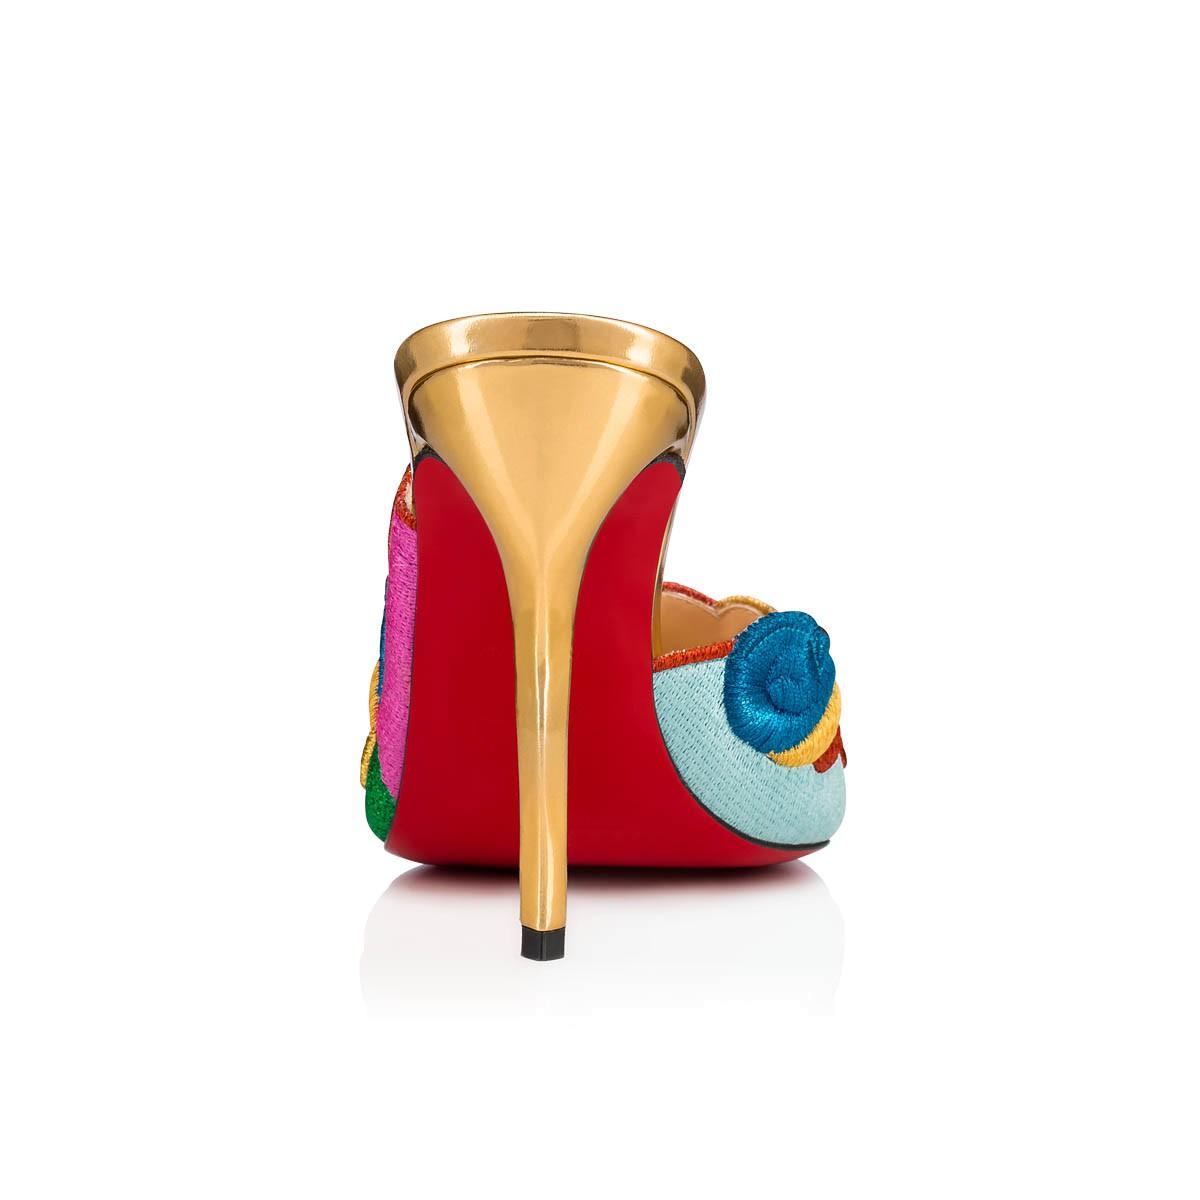 鞋履 - Thimpumule - Christian Louboutin